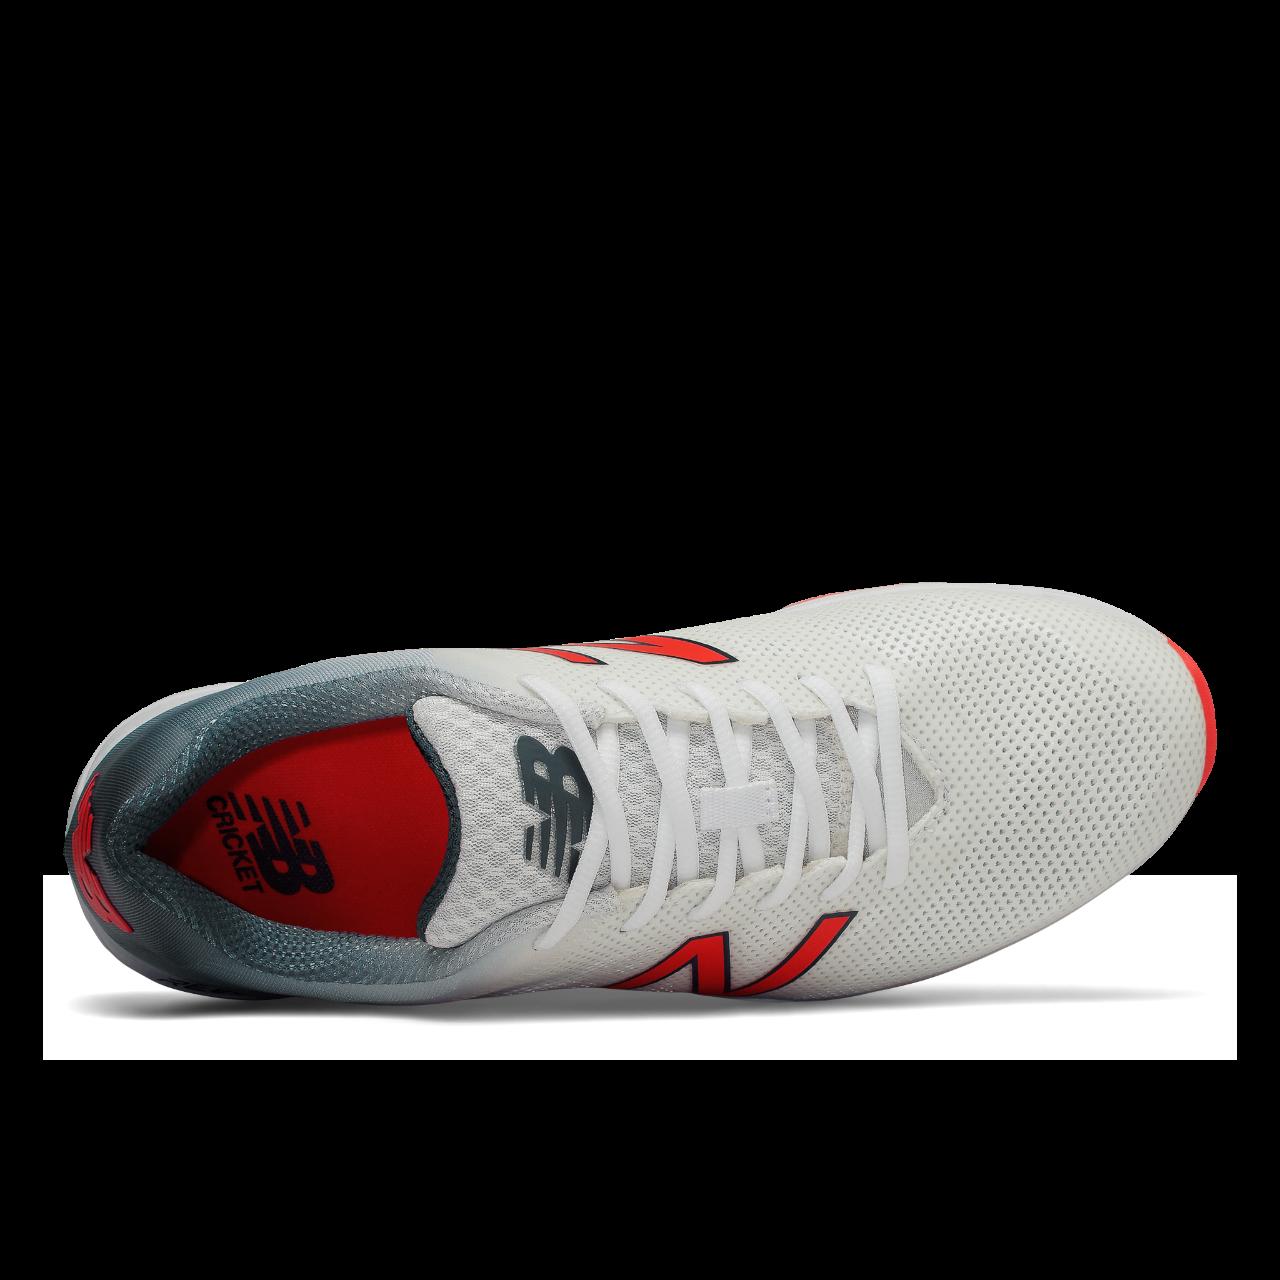 2019 New Balance CK10 WB3 Cricket Shoes